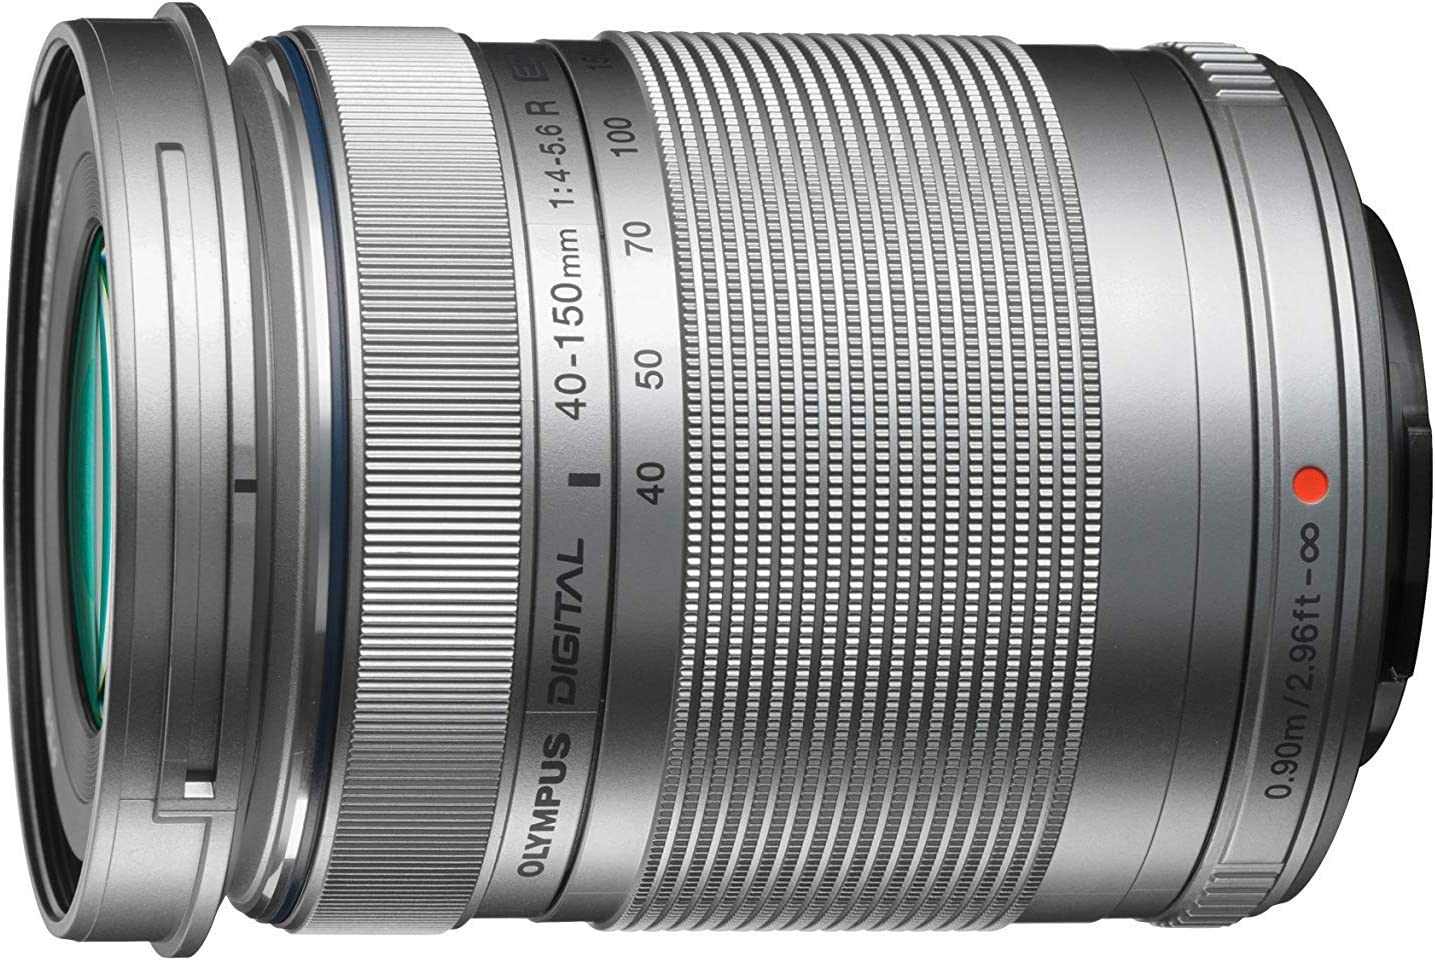 Olympus M.Zuiko - Objetivo digital ED 40 - 150 mm F4 - 5.6 II, teleObjetivo, apto para todas las cámaras MFT (modelos olympus OM - D & Pen, serie G de Panasonic), plata